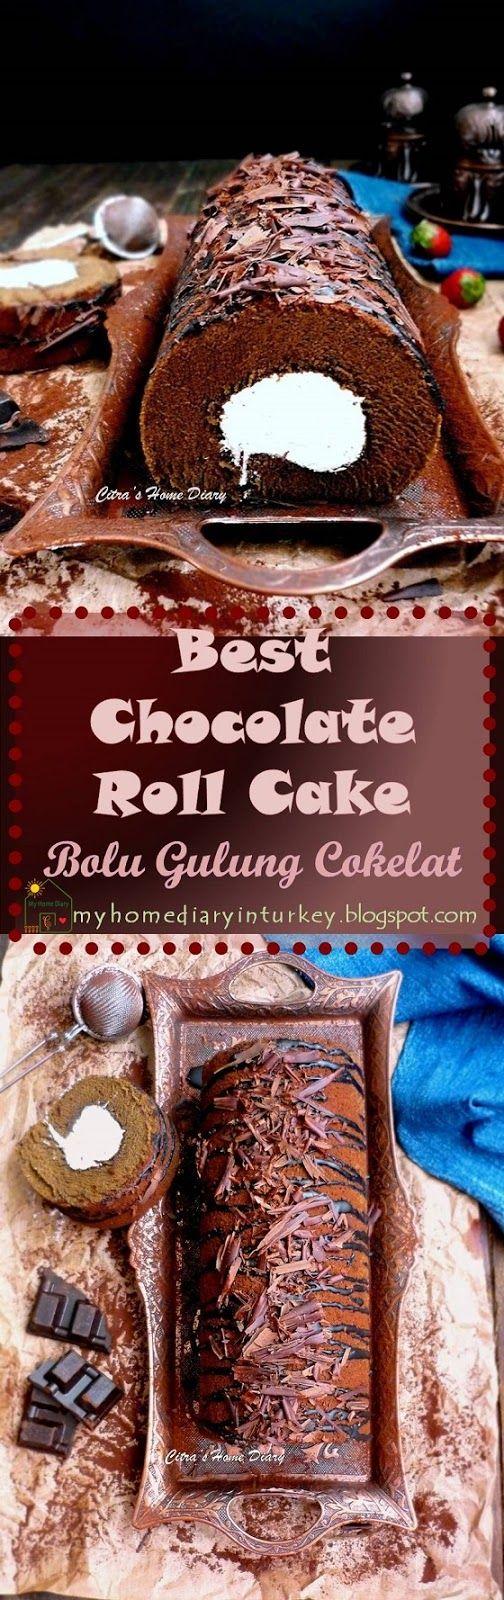 Best Chocolate Swiss Roll Cake / Bolu Gulung Cokelat yang lezat. #swissrollcake #chocolaterollcake #cakerecipes #dessert #chocolatedessert